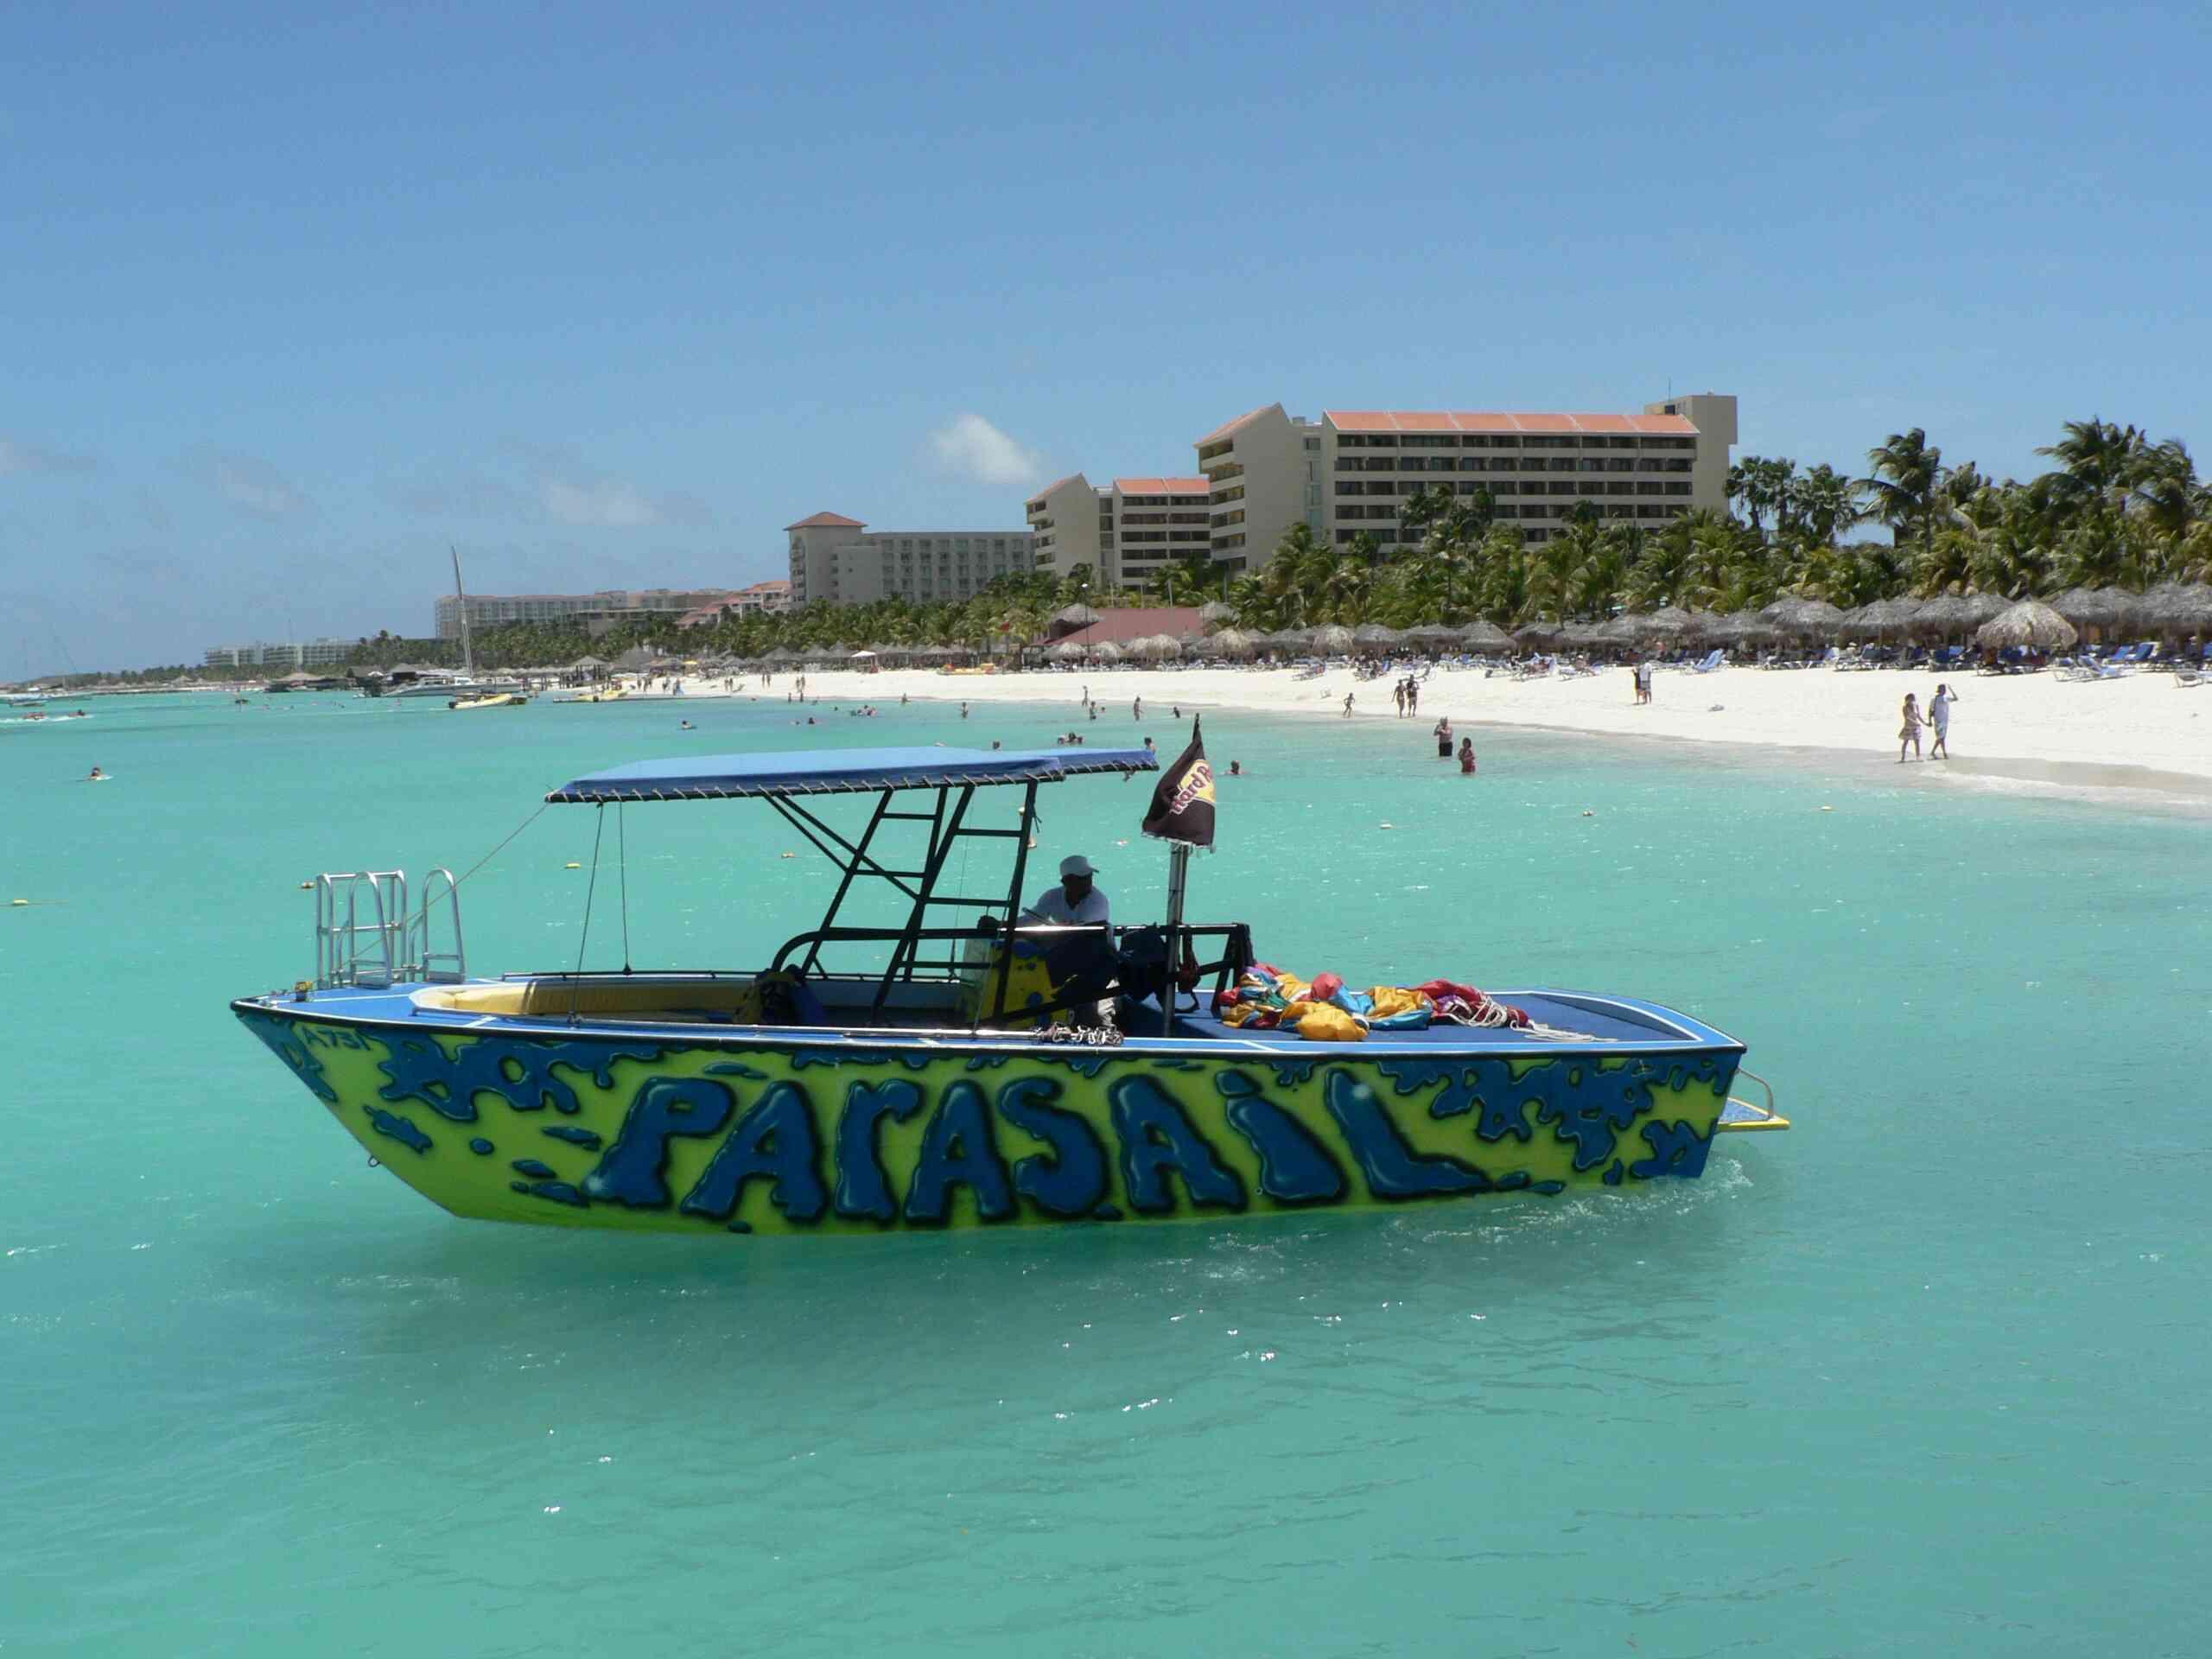 Palm Beach Aruba  city pictures gallery : Palm Beach, Aruba 4901990402 Wikimedia Commons